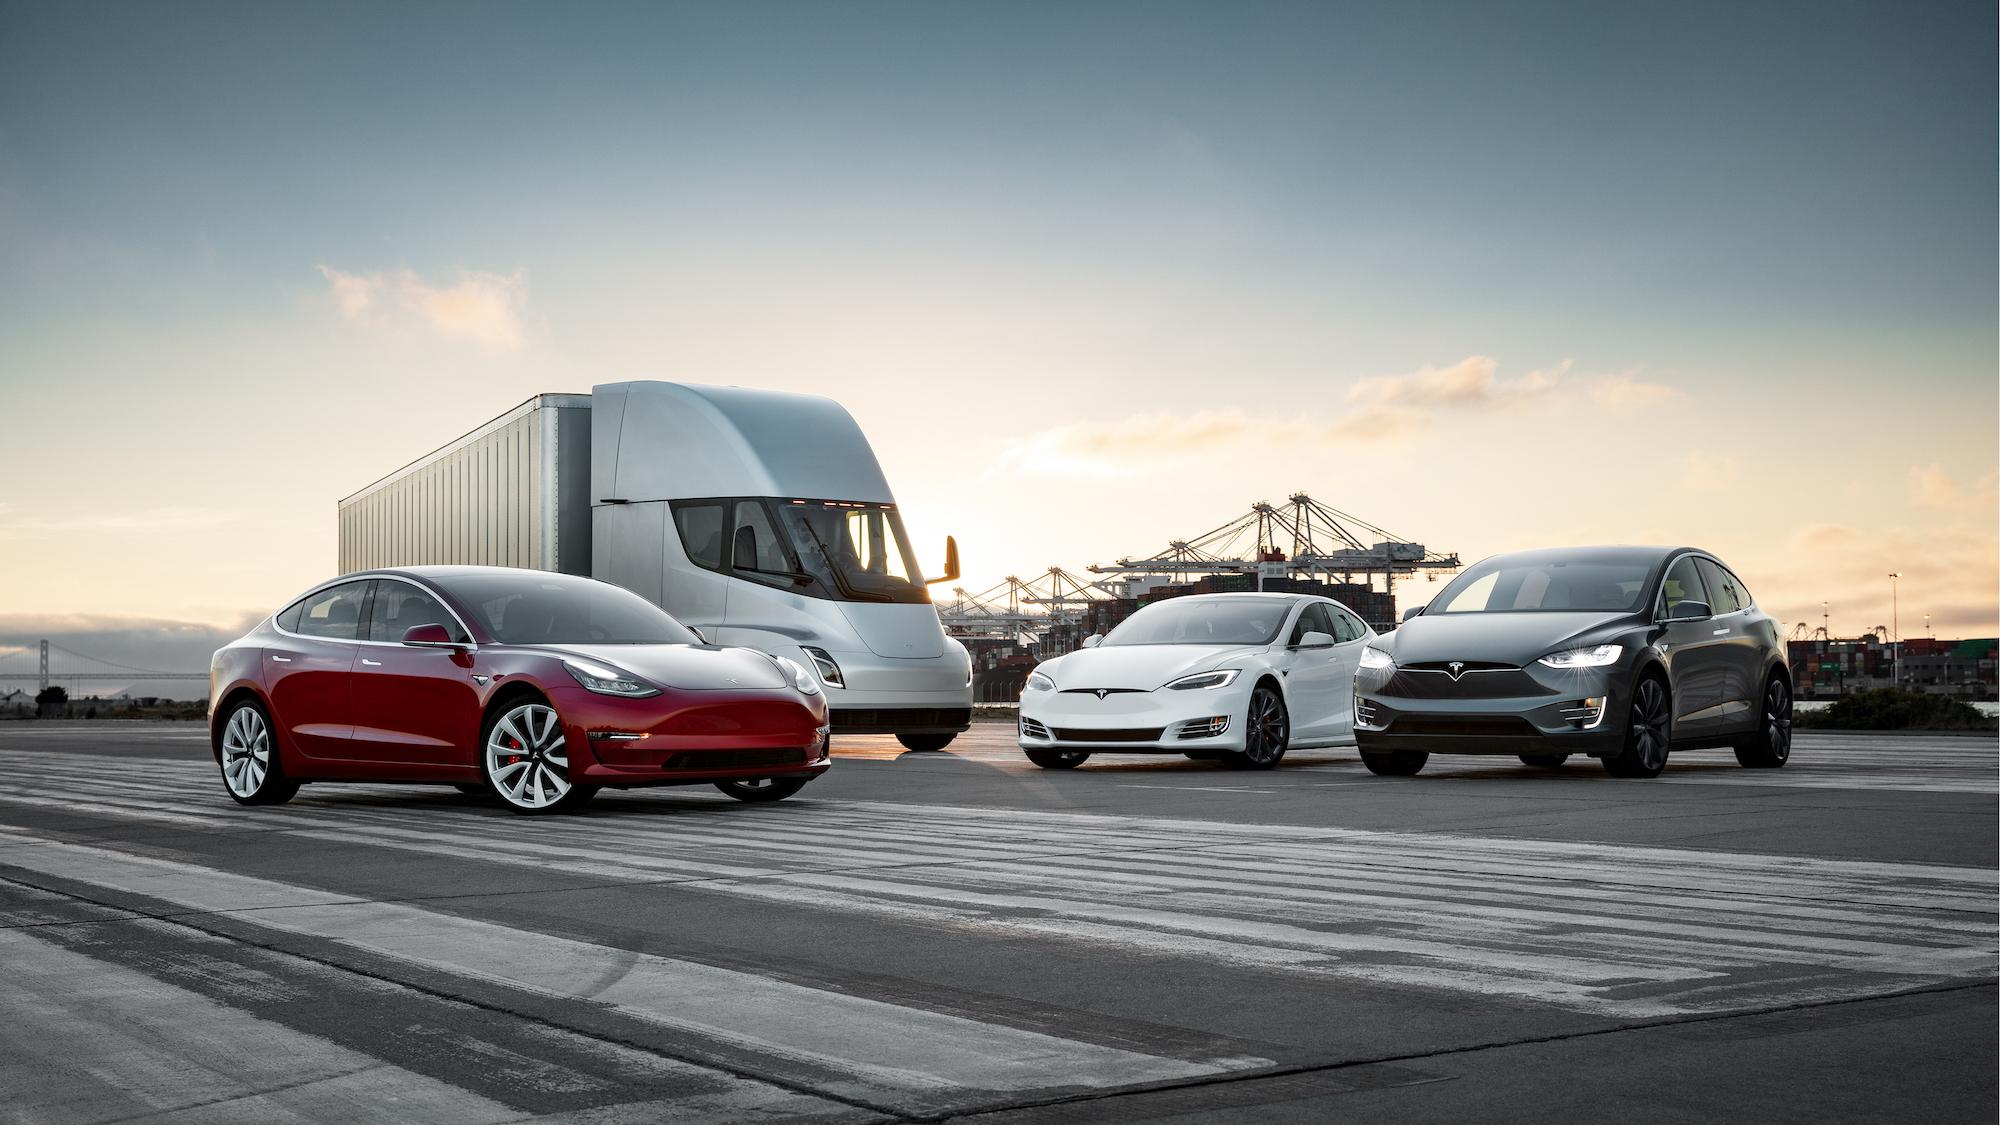 Tesla vehicles, including the Model 3, Tesla Semi, Model S, and Model X, parked on a lot